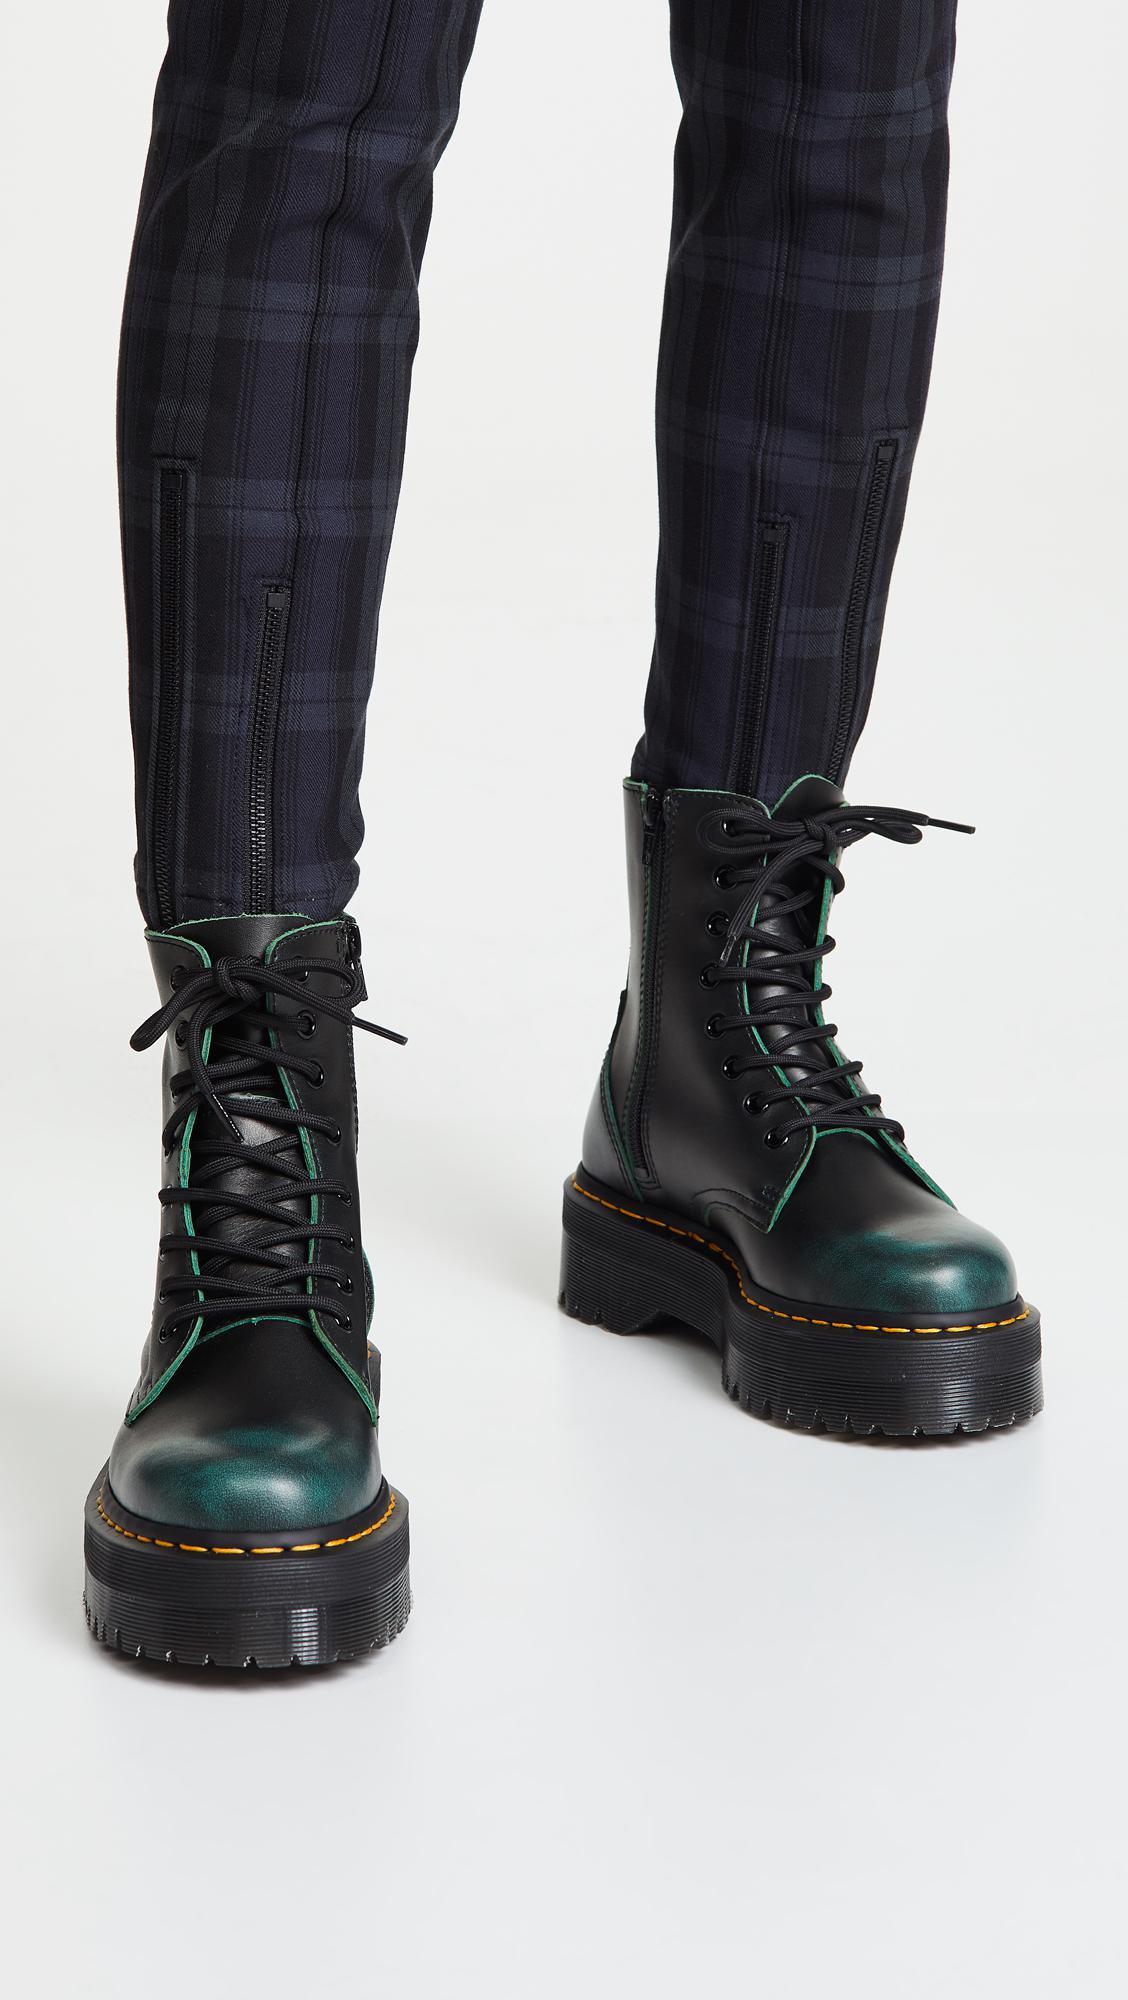 f9bf7e86d2e155 Dr. Martens Jadon 8 Eye Boots in Green - Lyst